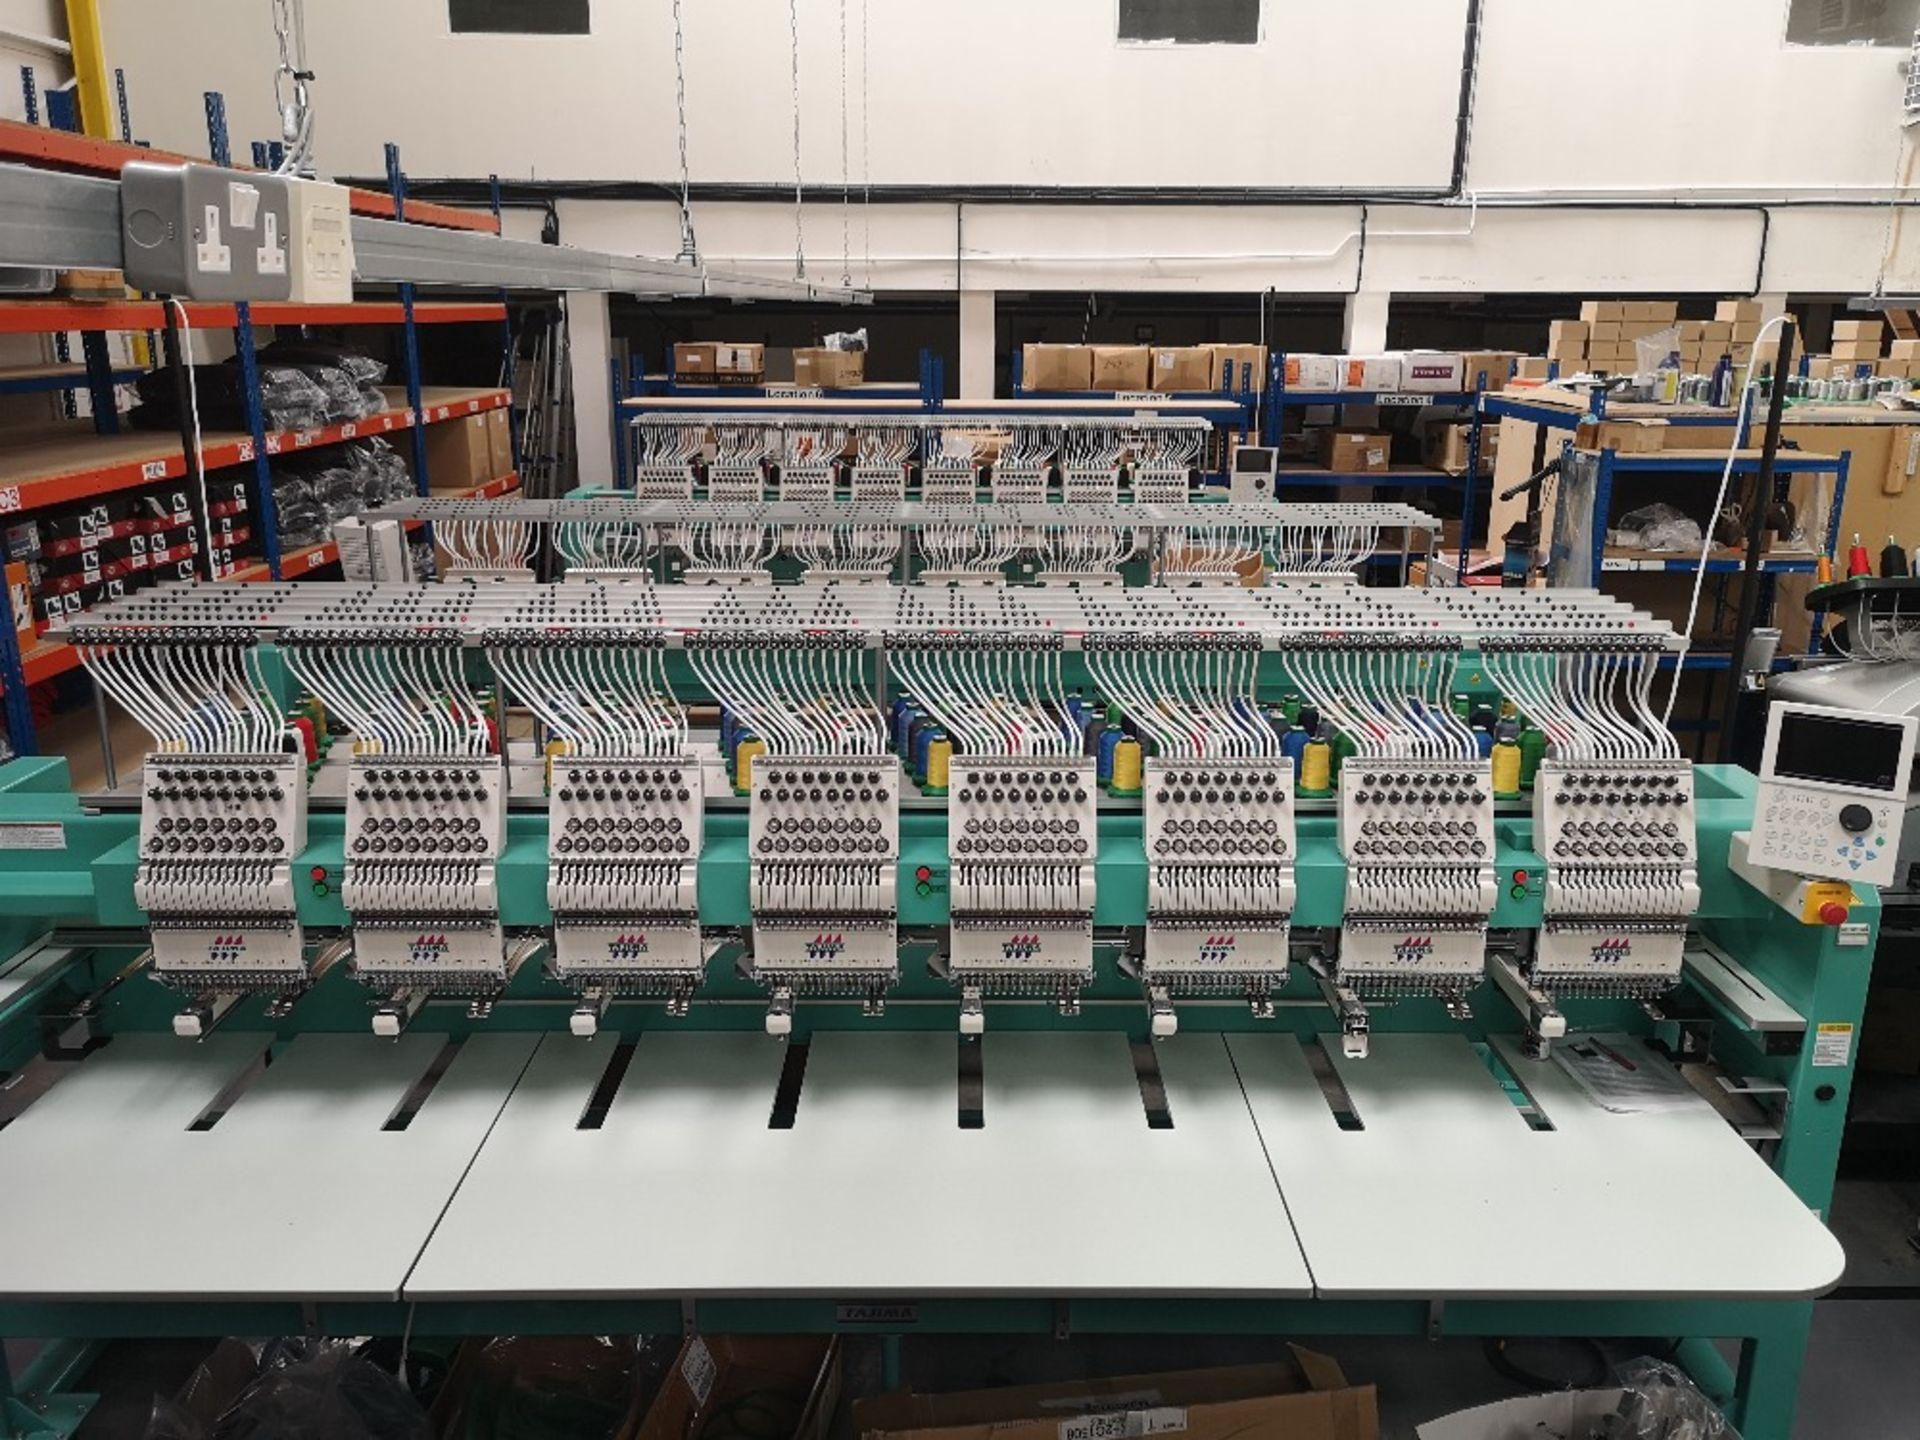 Tajima TFMX-II C1508 Electronic Multi Head Automatic Embroidery Machine (2017) - Image 3 of 12